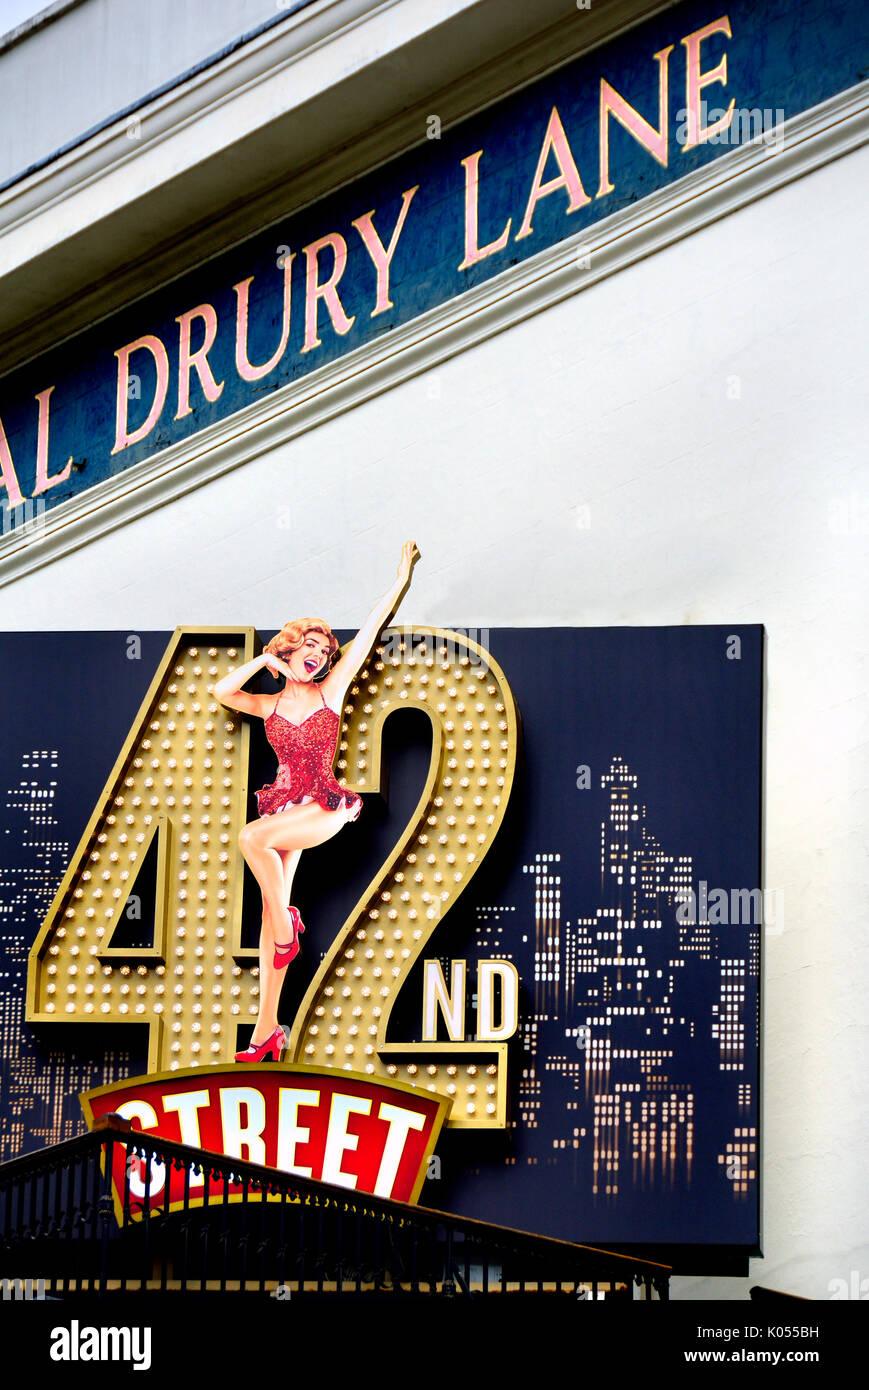 London, England, UK. '42nd Street' at the Theatre Royal Drury Lane (Aug 2017) - Stock Image